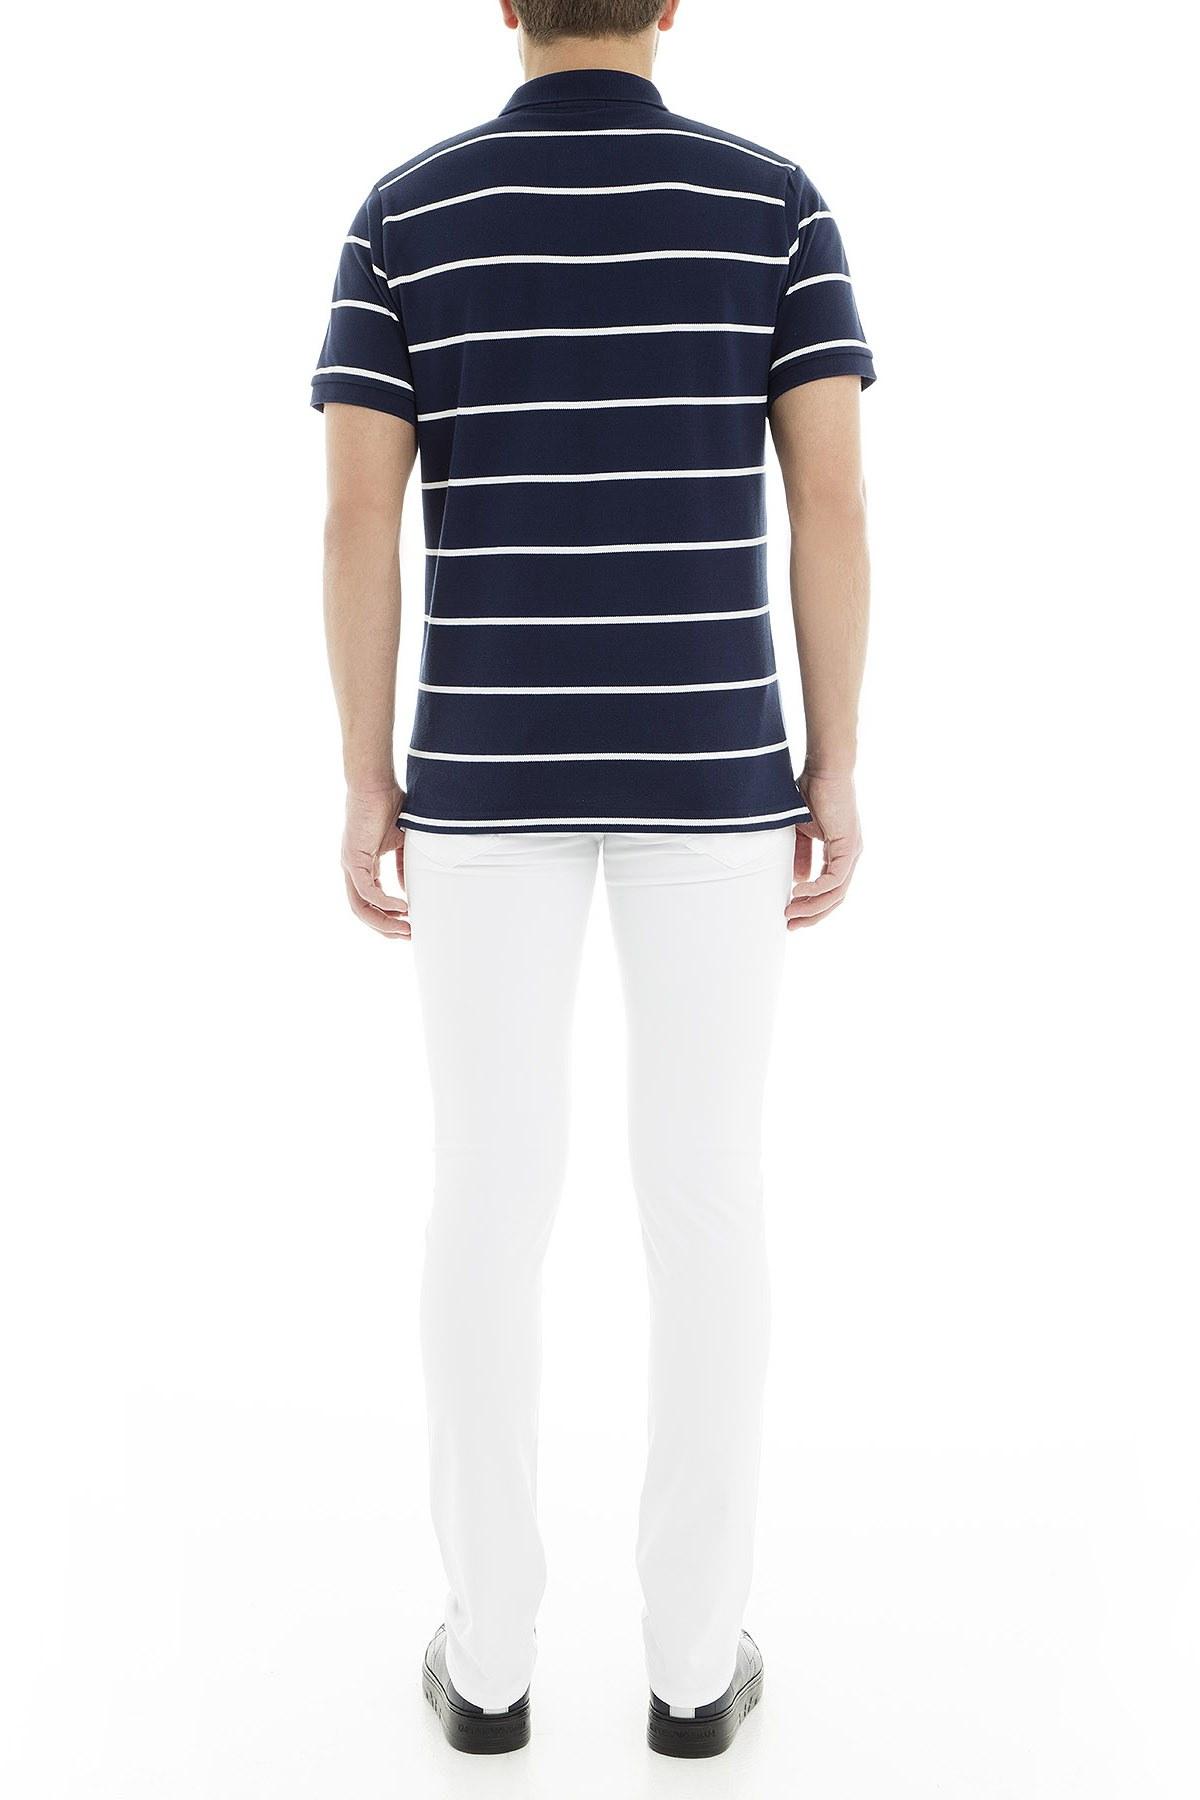 Jacob Cohen Jeans Erkek Pamuklu Pantolon J622566V 111 BEYAZ